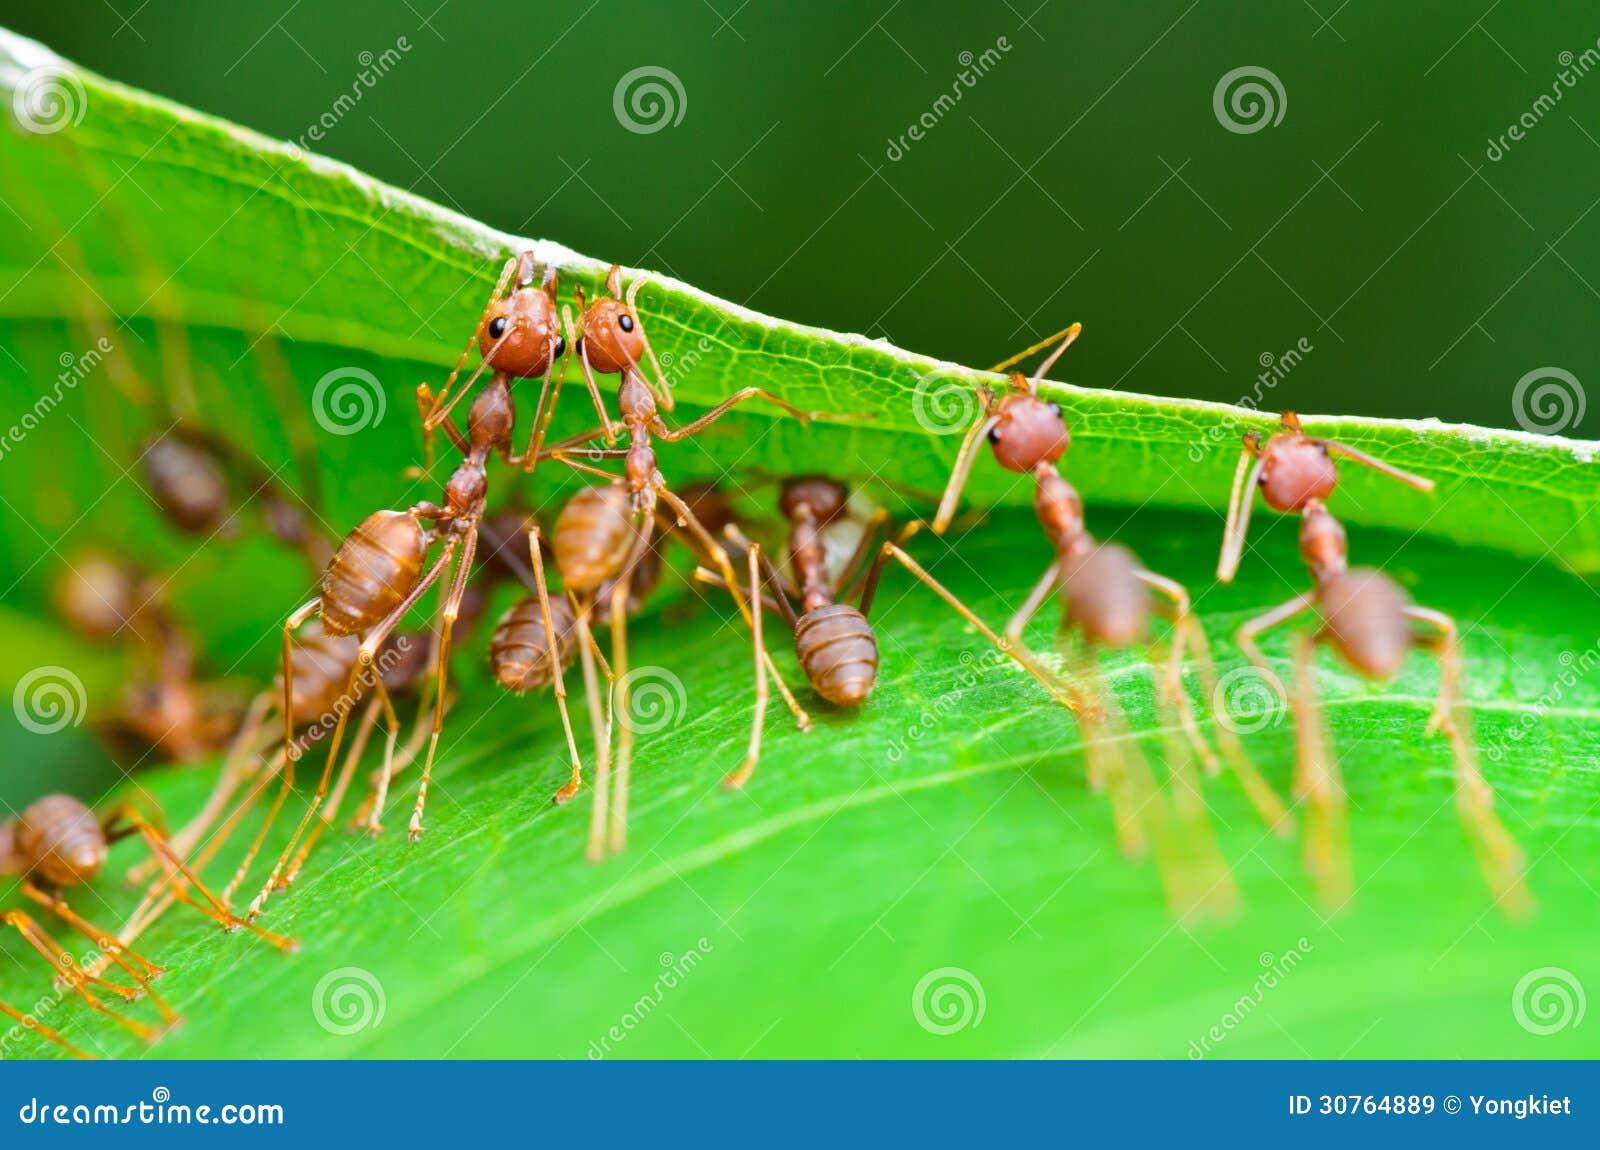 Smaragdina de Oecophylla (os nomes comuns incluem Weaver Ant,